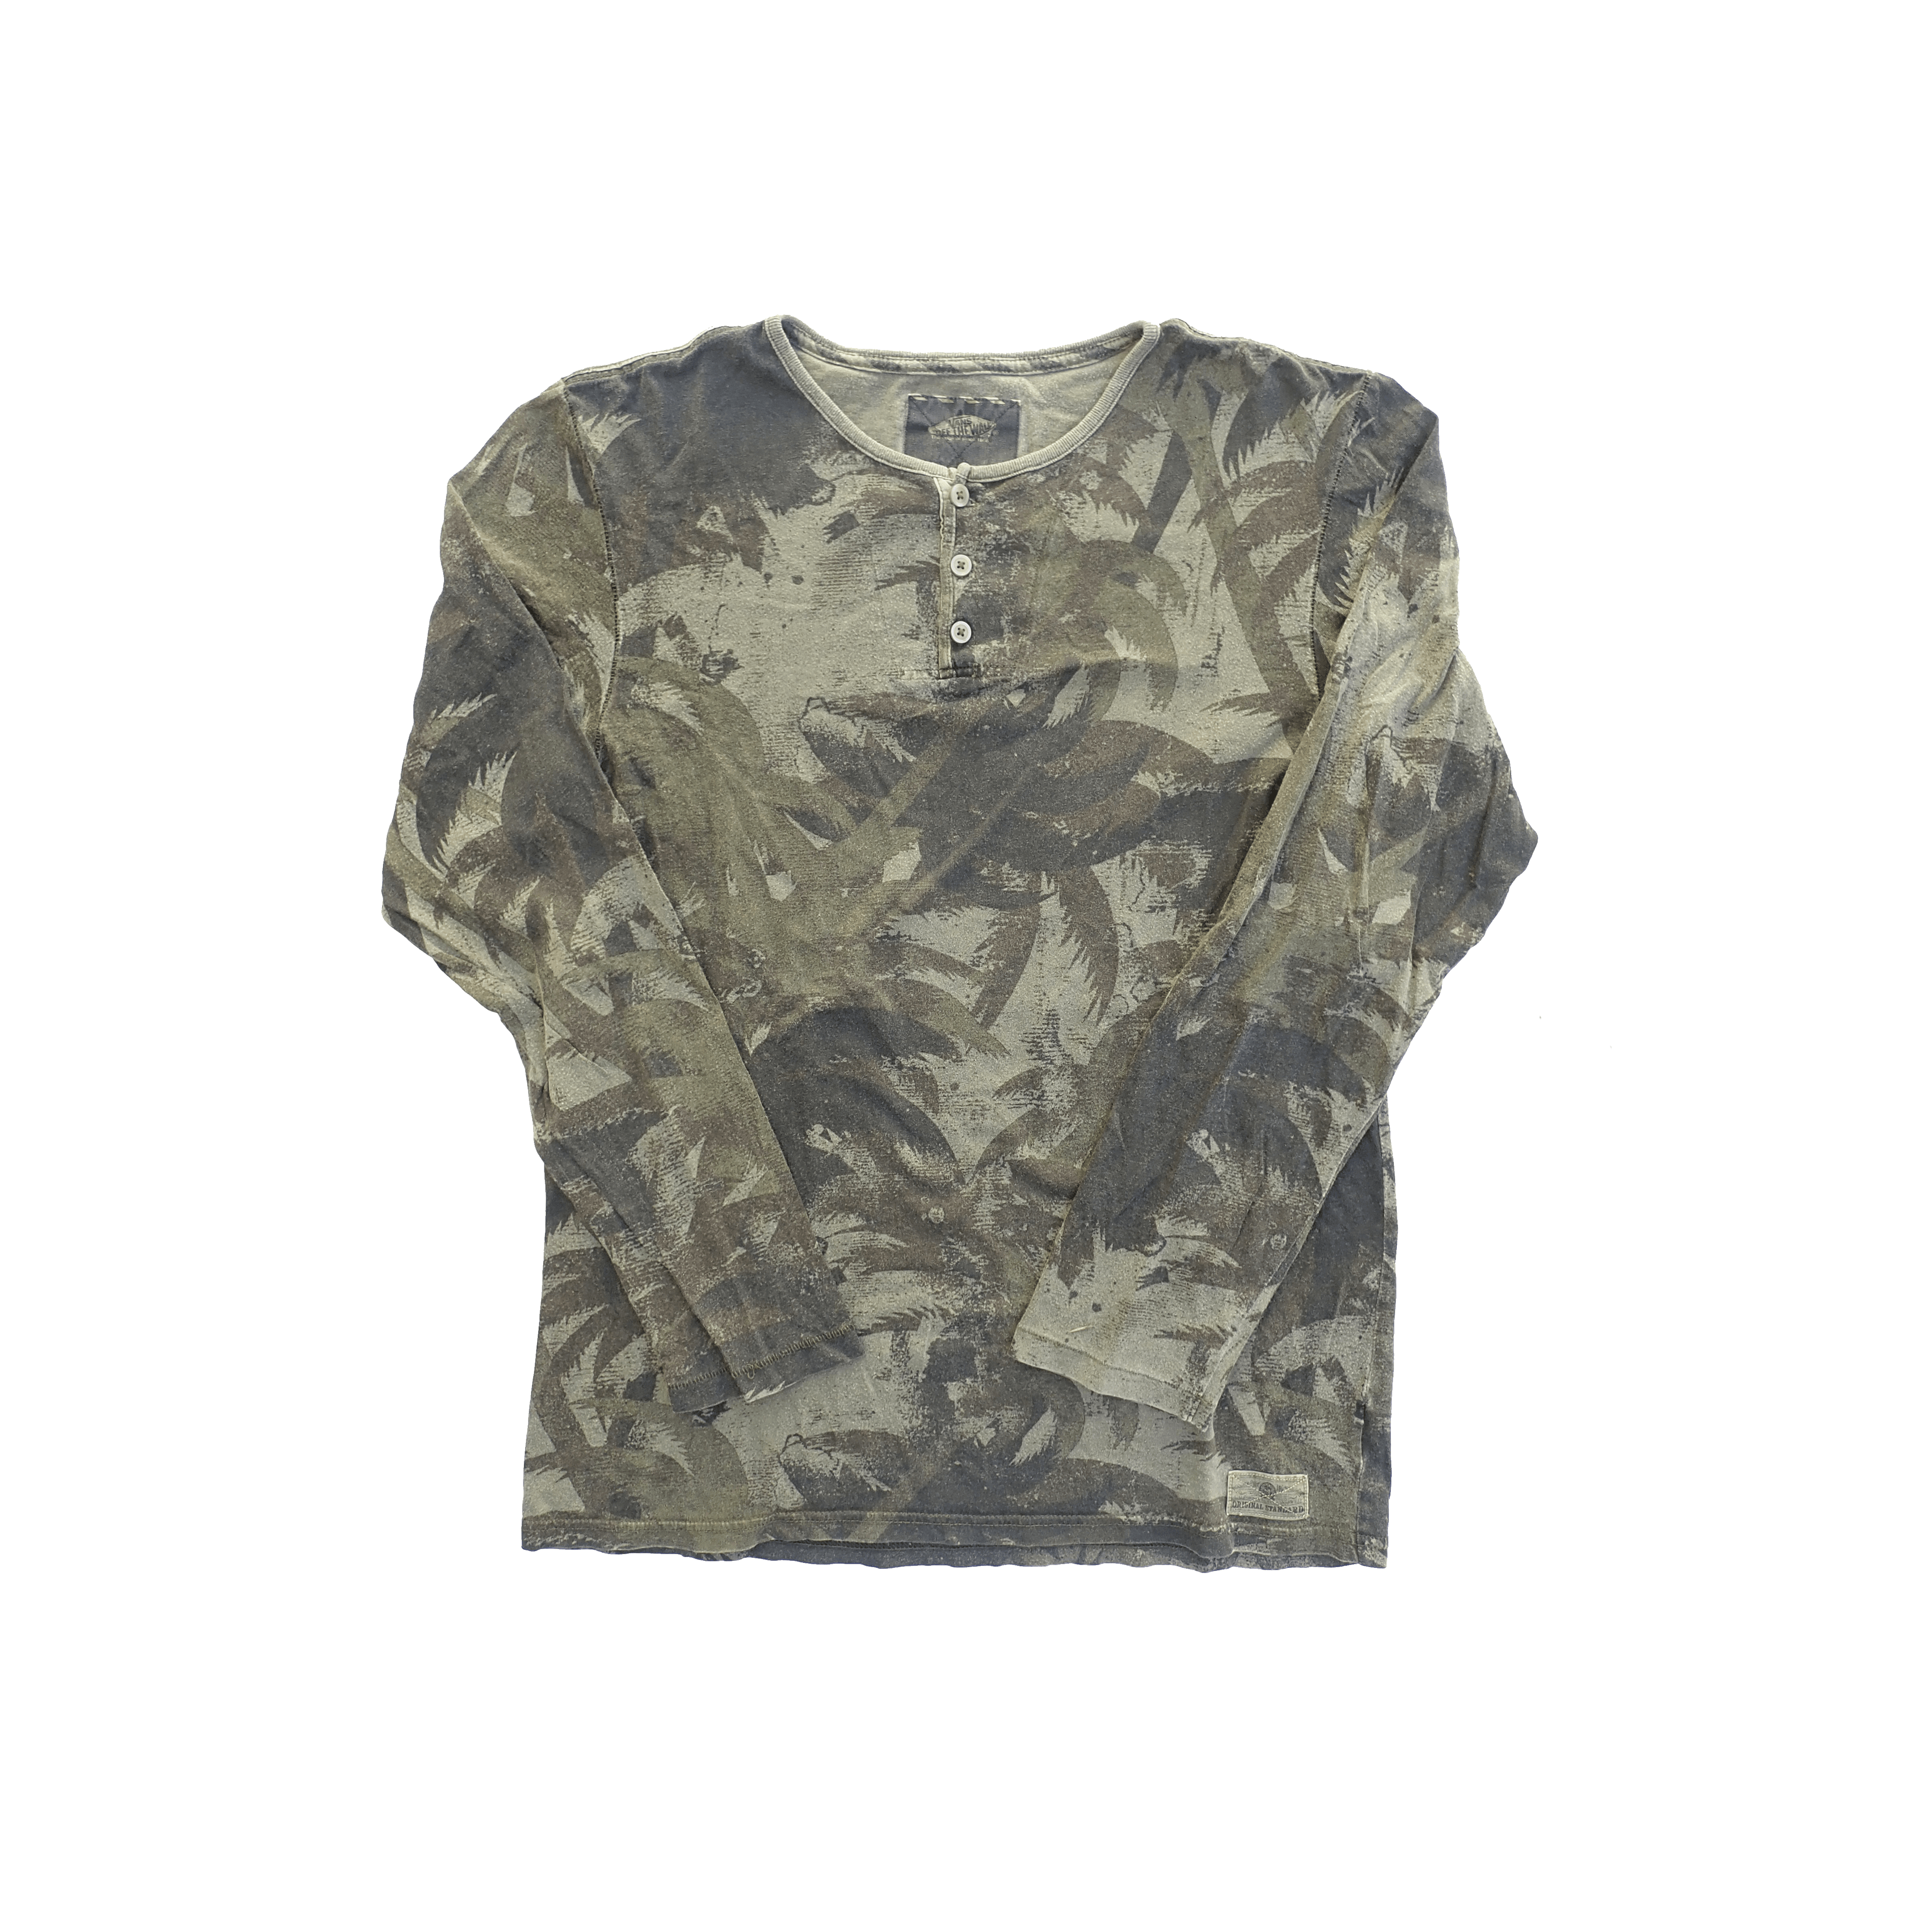 Vans Longsleeve T Shirt